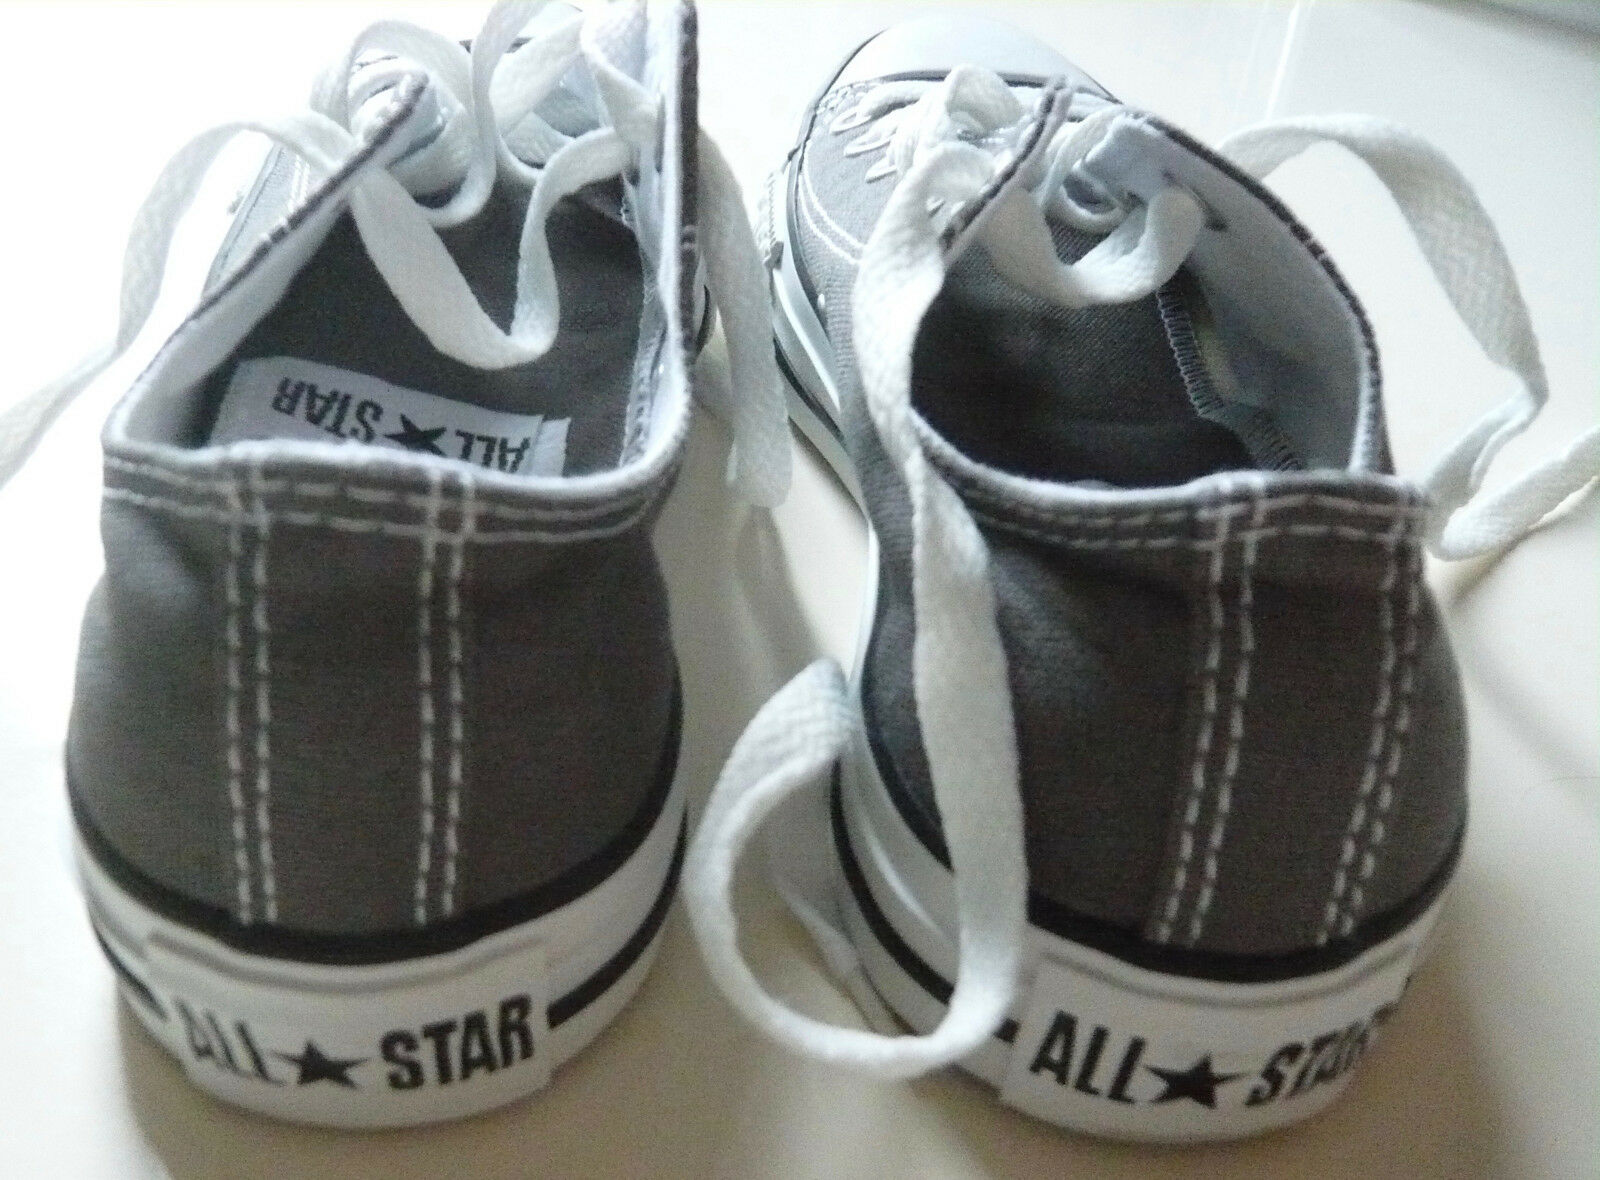 Converse CT charcoal A/S SEASNL OX Sneakers Gr. 37 charcoal CT 1J794 Chucks grau 2afa89